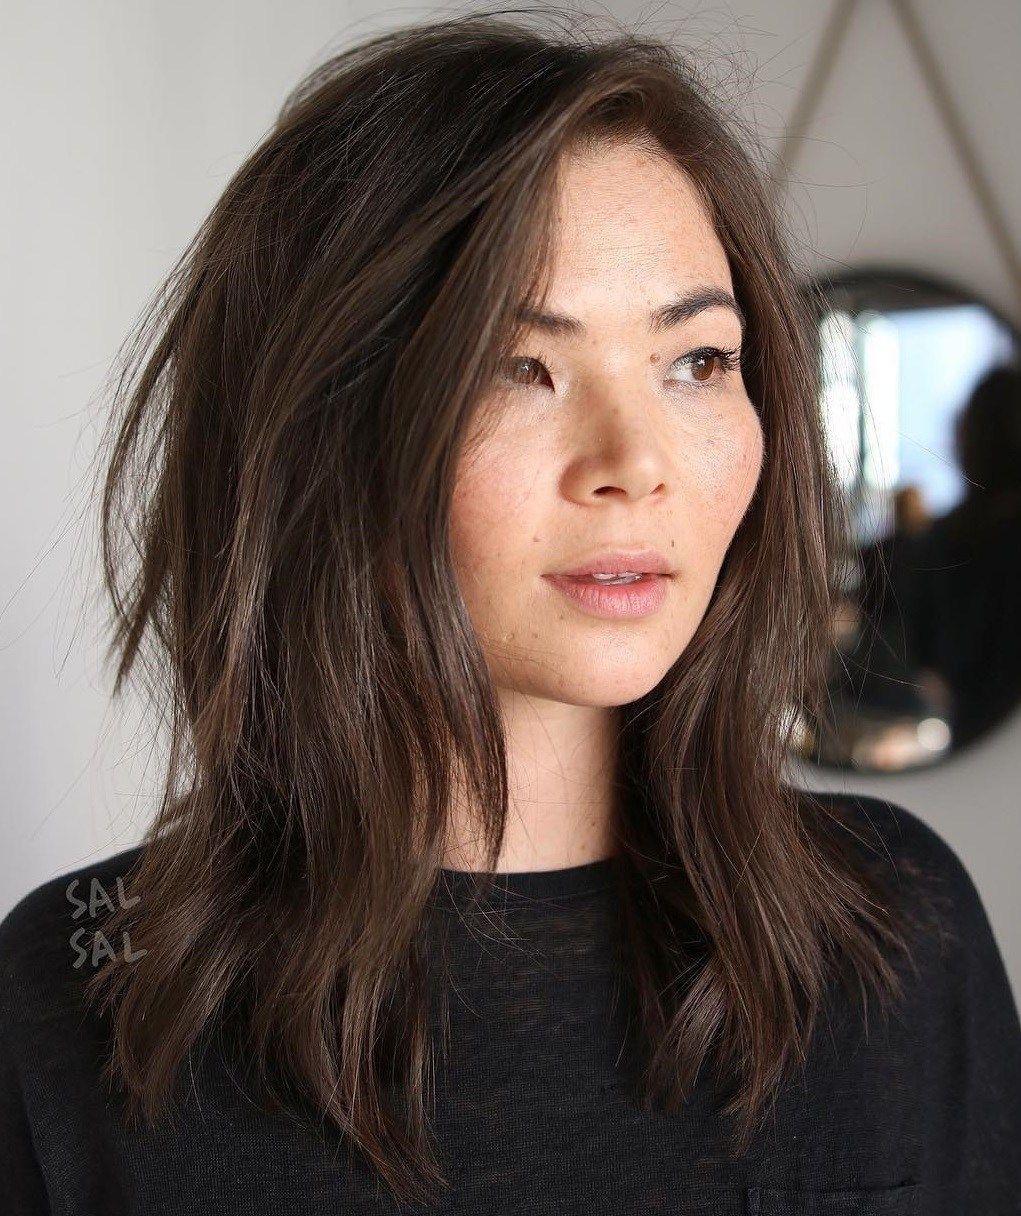 39+ Medium hairstyles for thin hair long face ideas